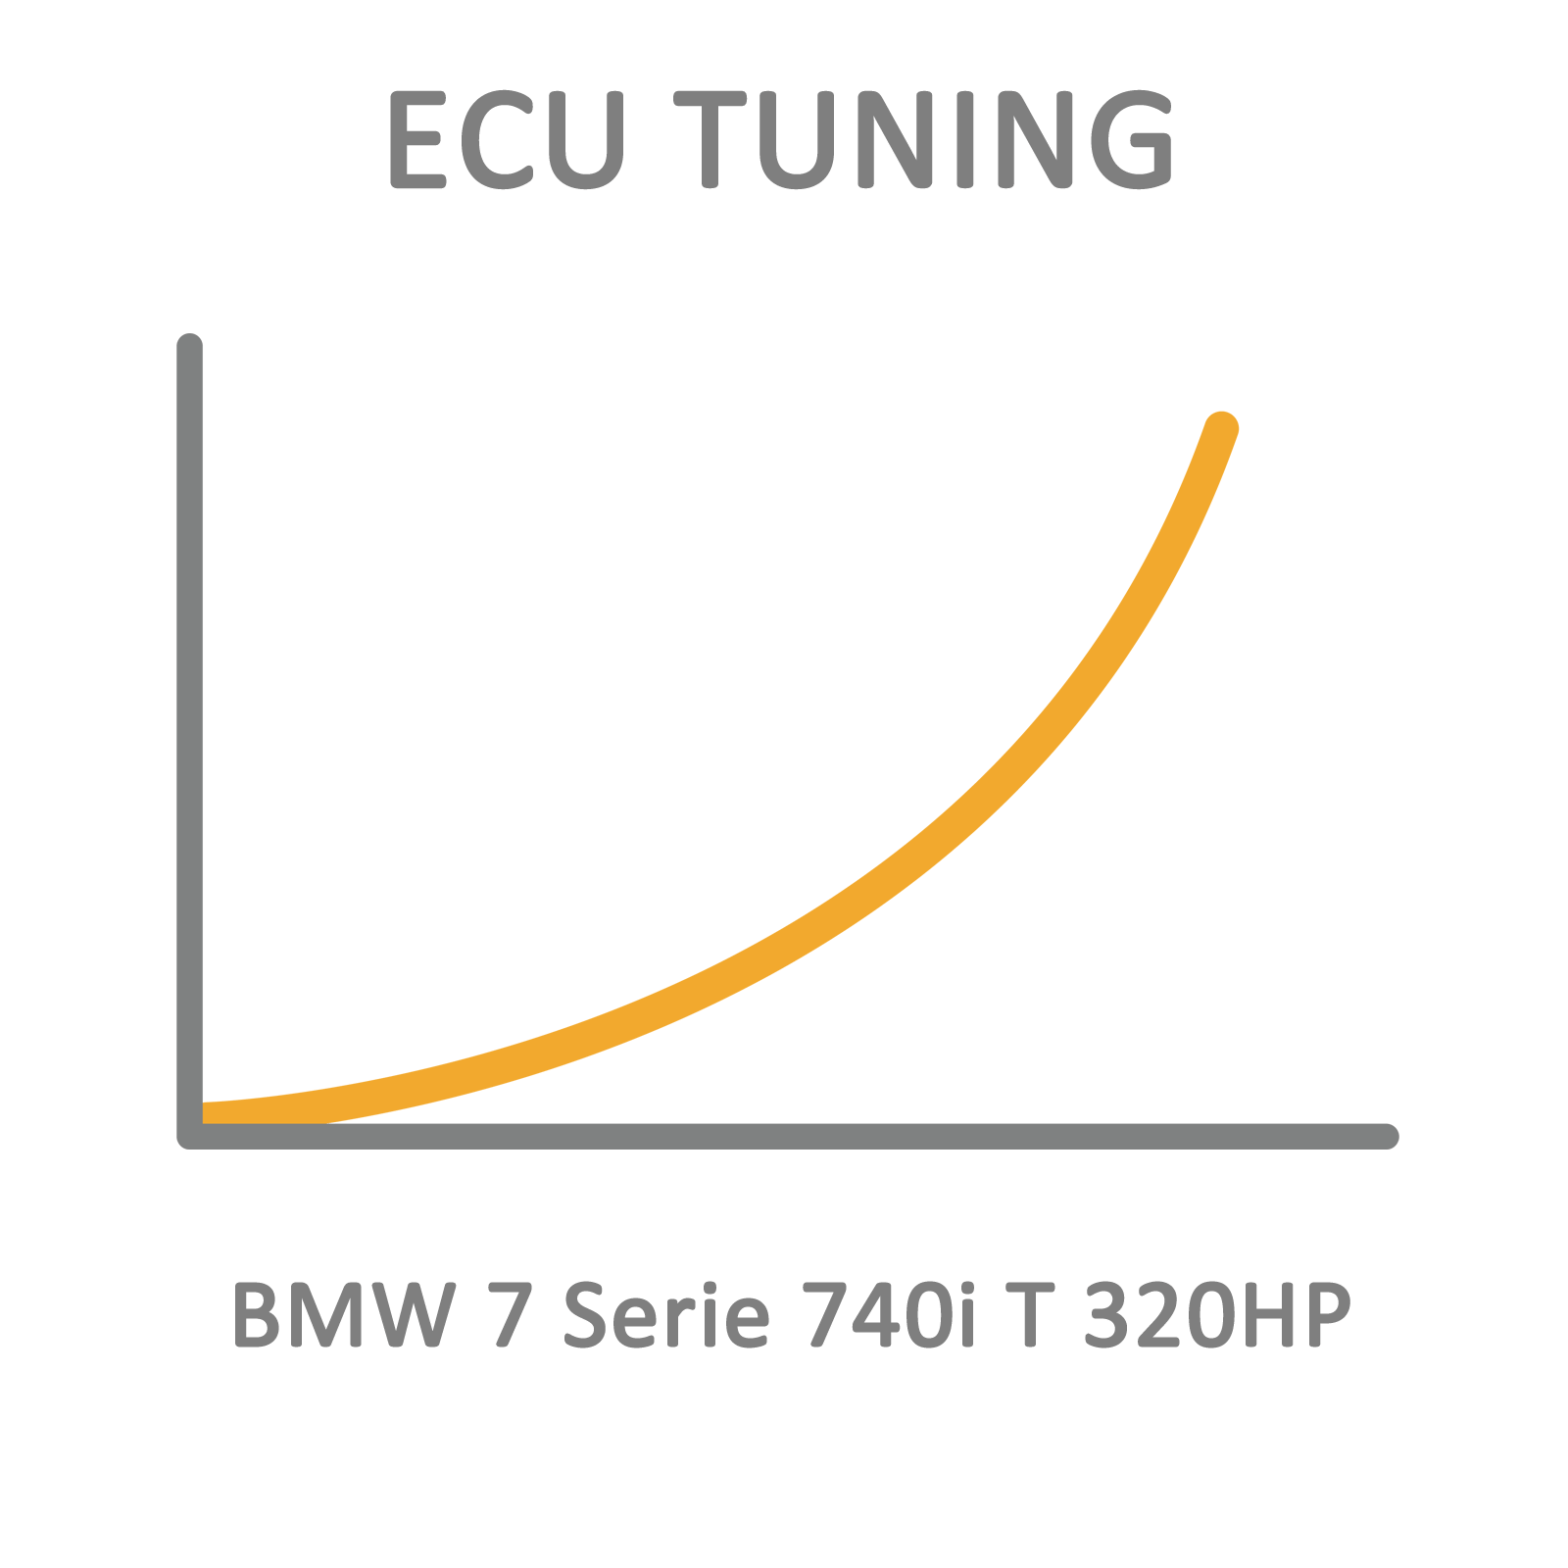 BMW 7 Series 740i T 320HP ECU Tuning Remapping Programming